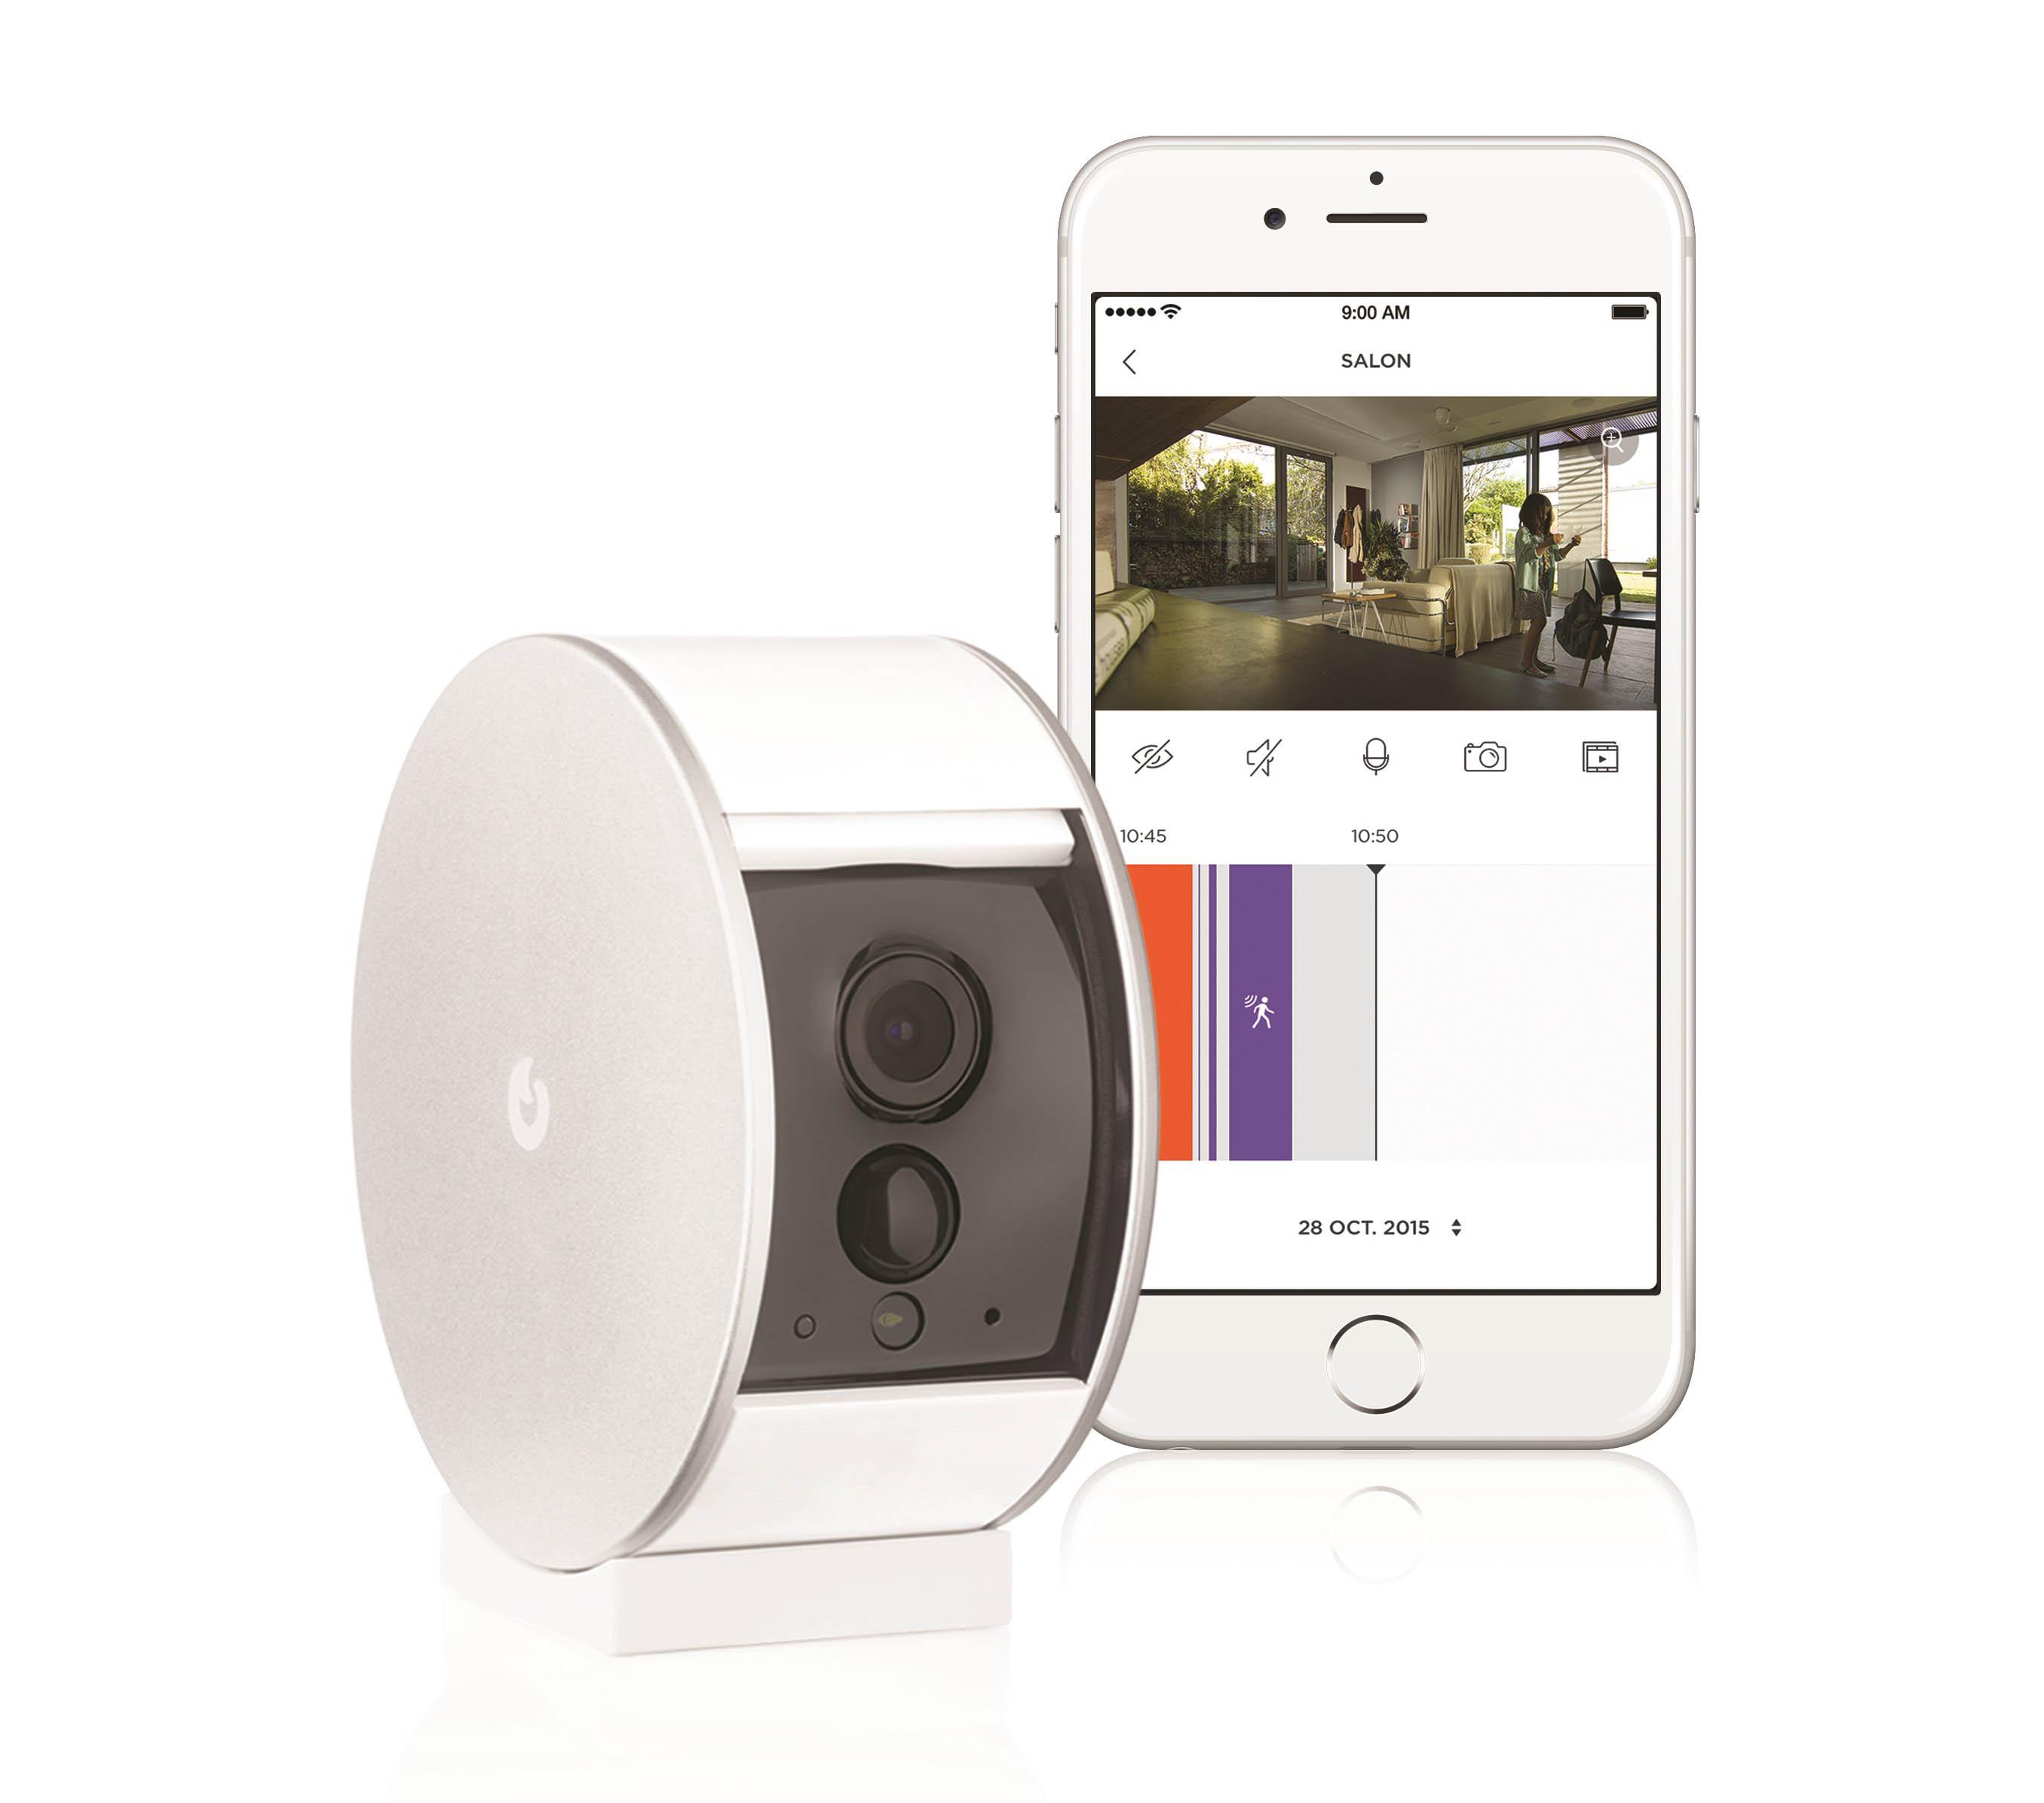 Myfox Security Camera 2016